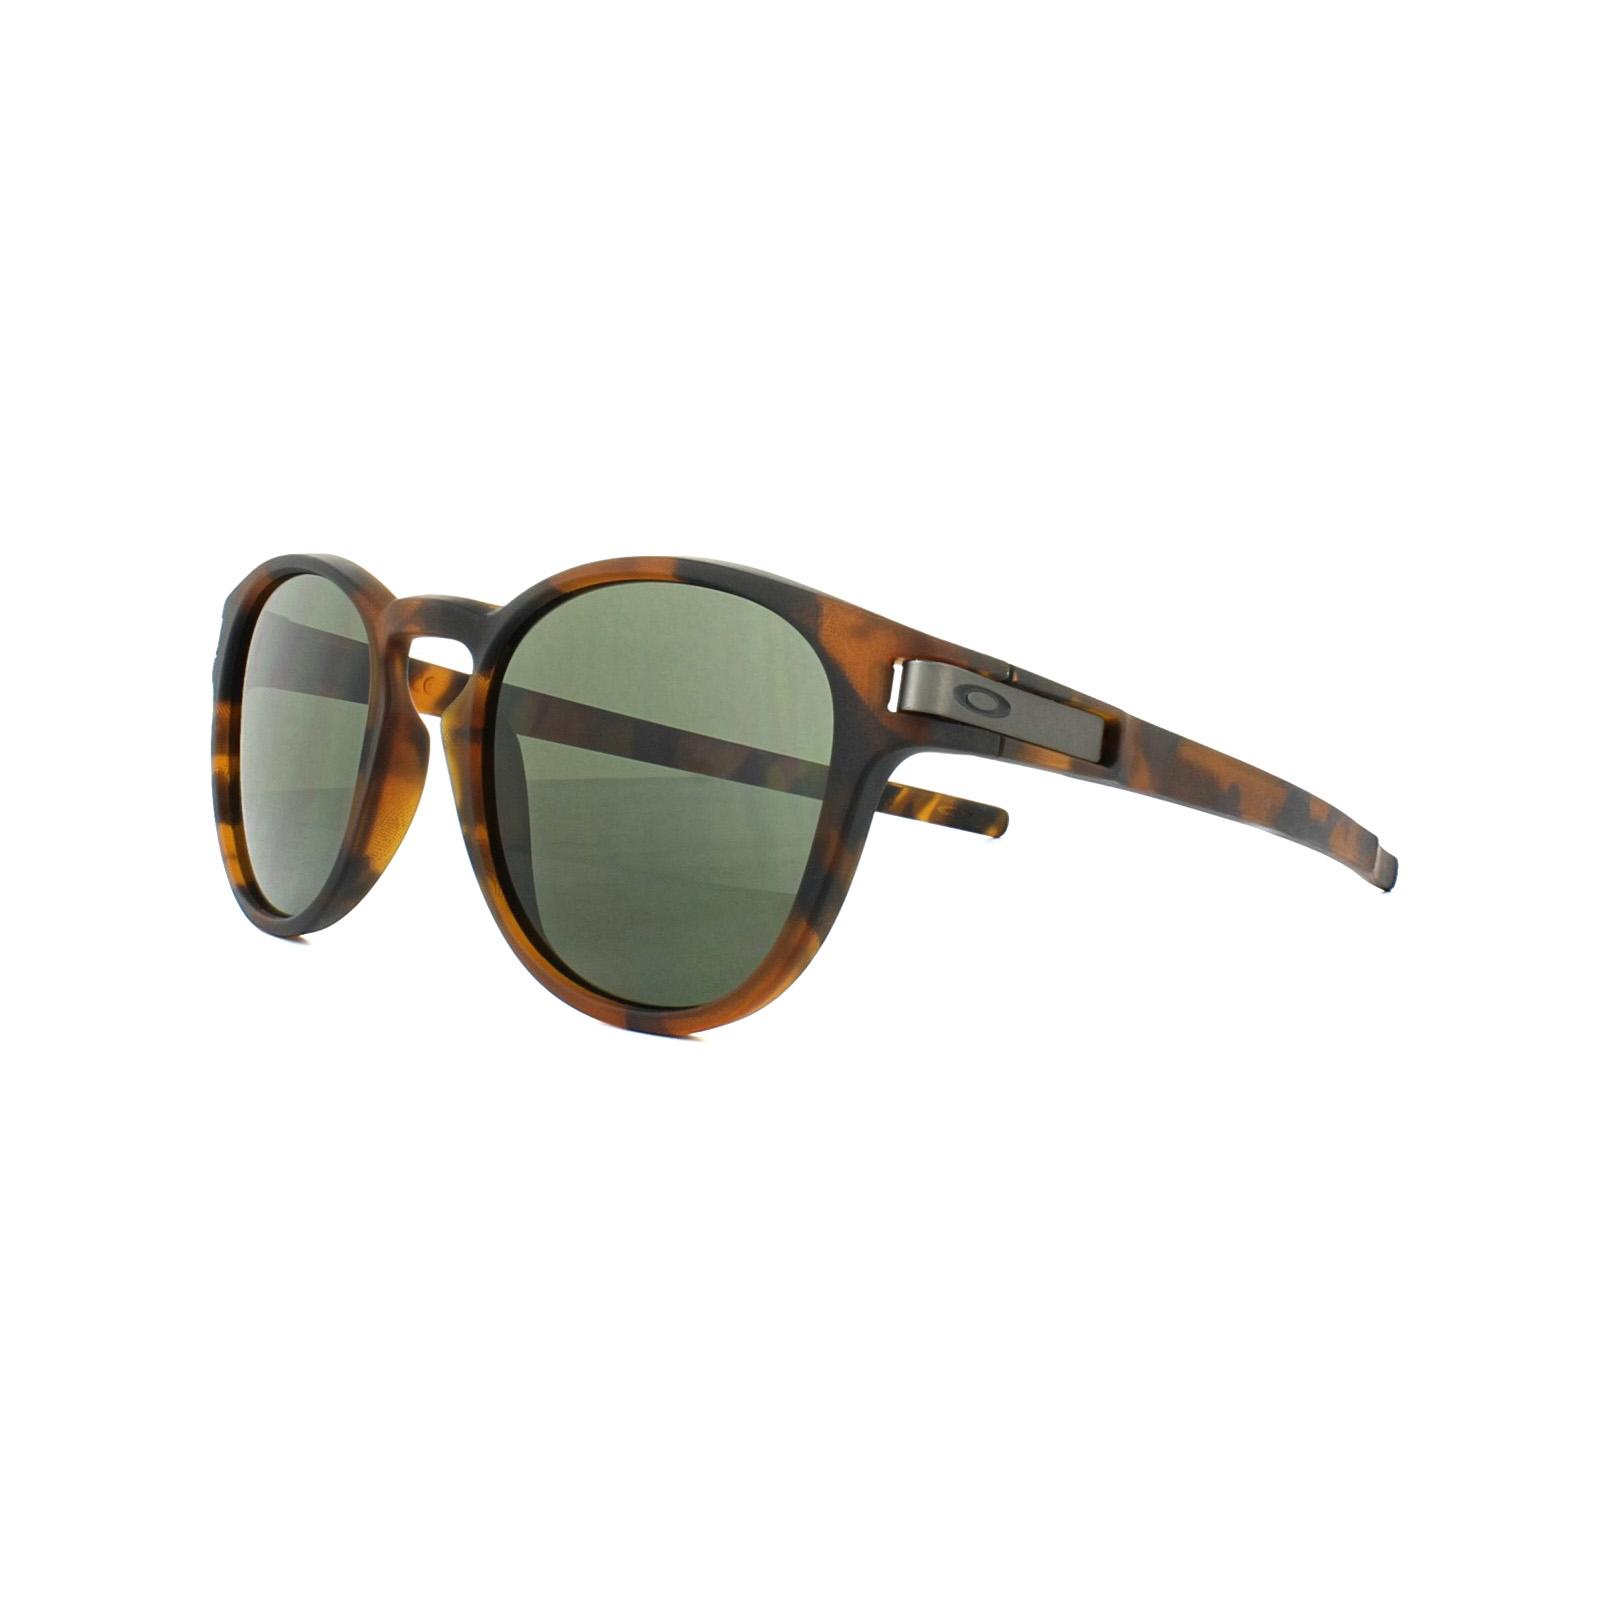 a9a7c66f3e493d Sentinel Oakley Sunglasses Latch OO9265-02 Matt Brown Tortoise Dark Grey